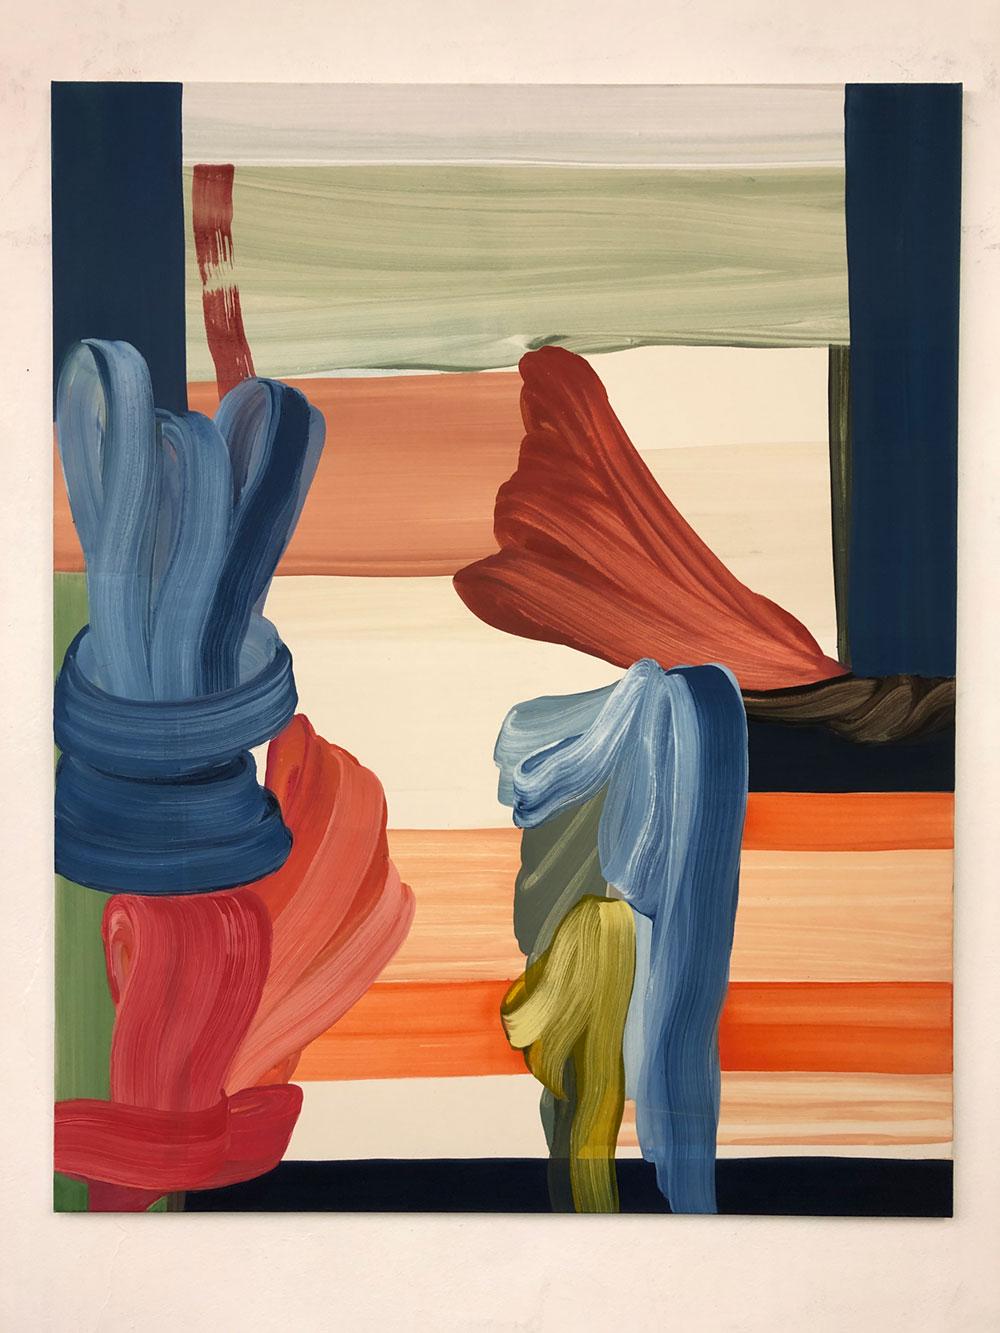 moje assefjah Aile Rouge 2020 eggtempera on canvas 150x-120 cm sholeh abghari art gallery marbella